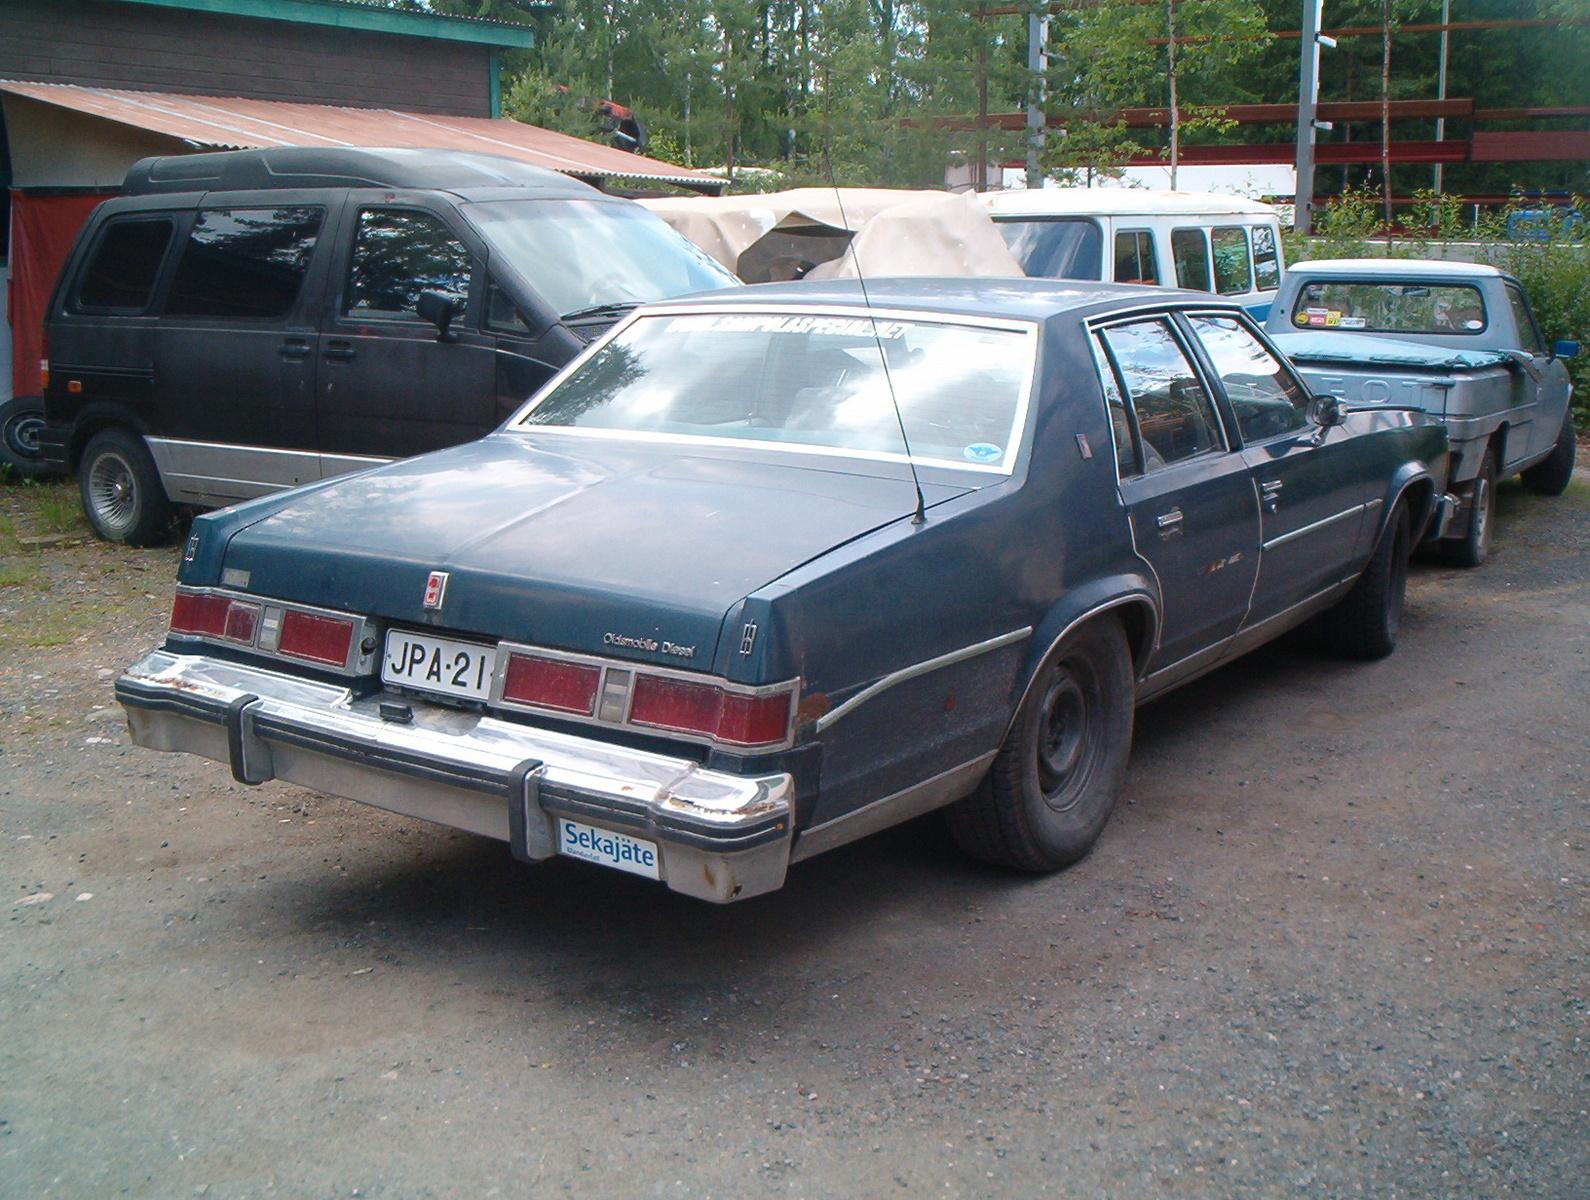 1978 Oldsmobile Eighty-Eight - Overview - CarGurus